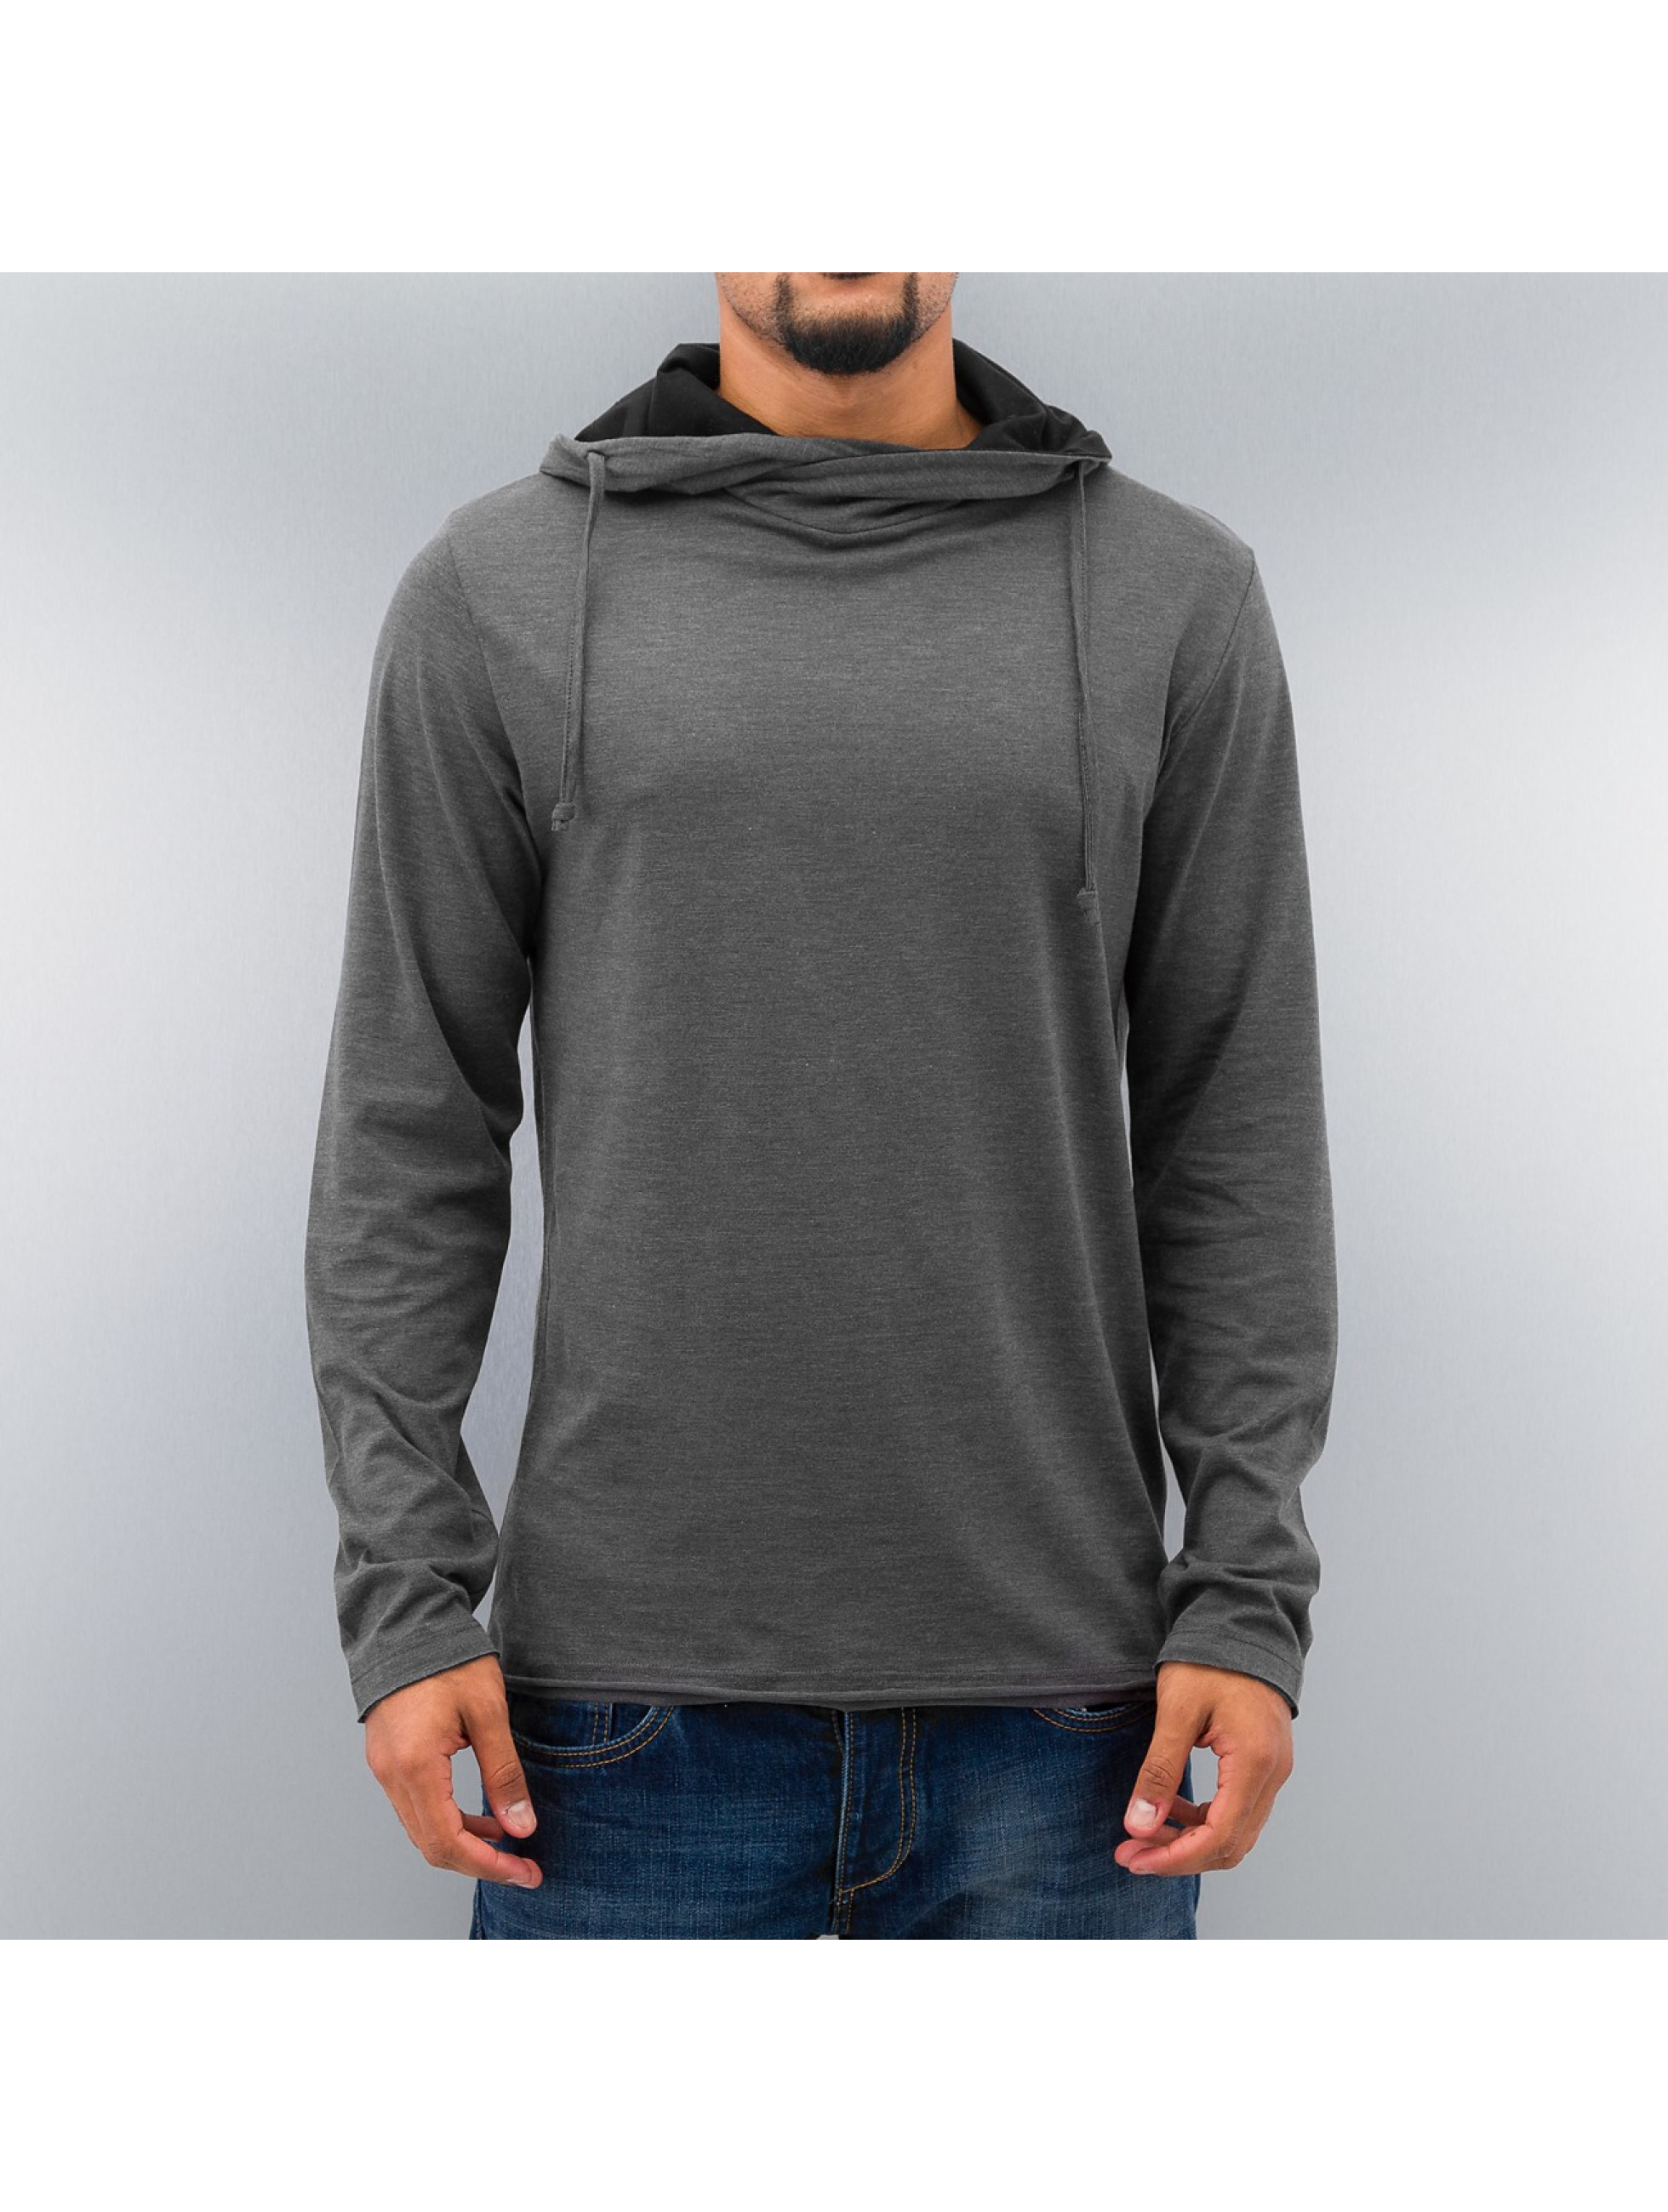 Selected Пуловер London High Neck серый